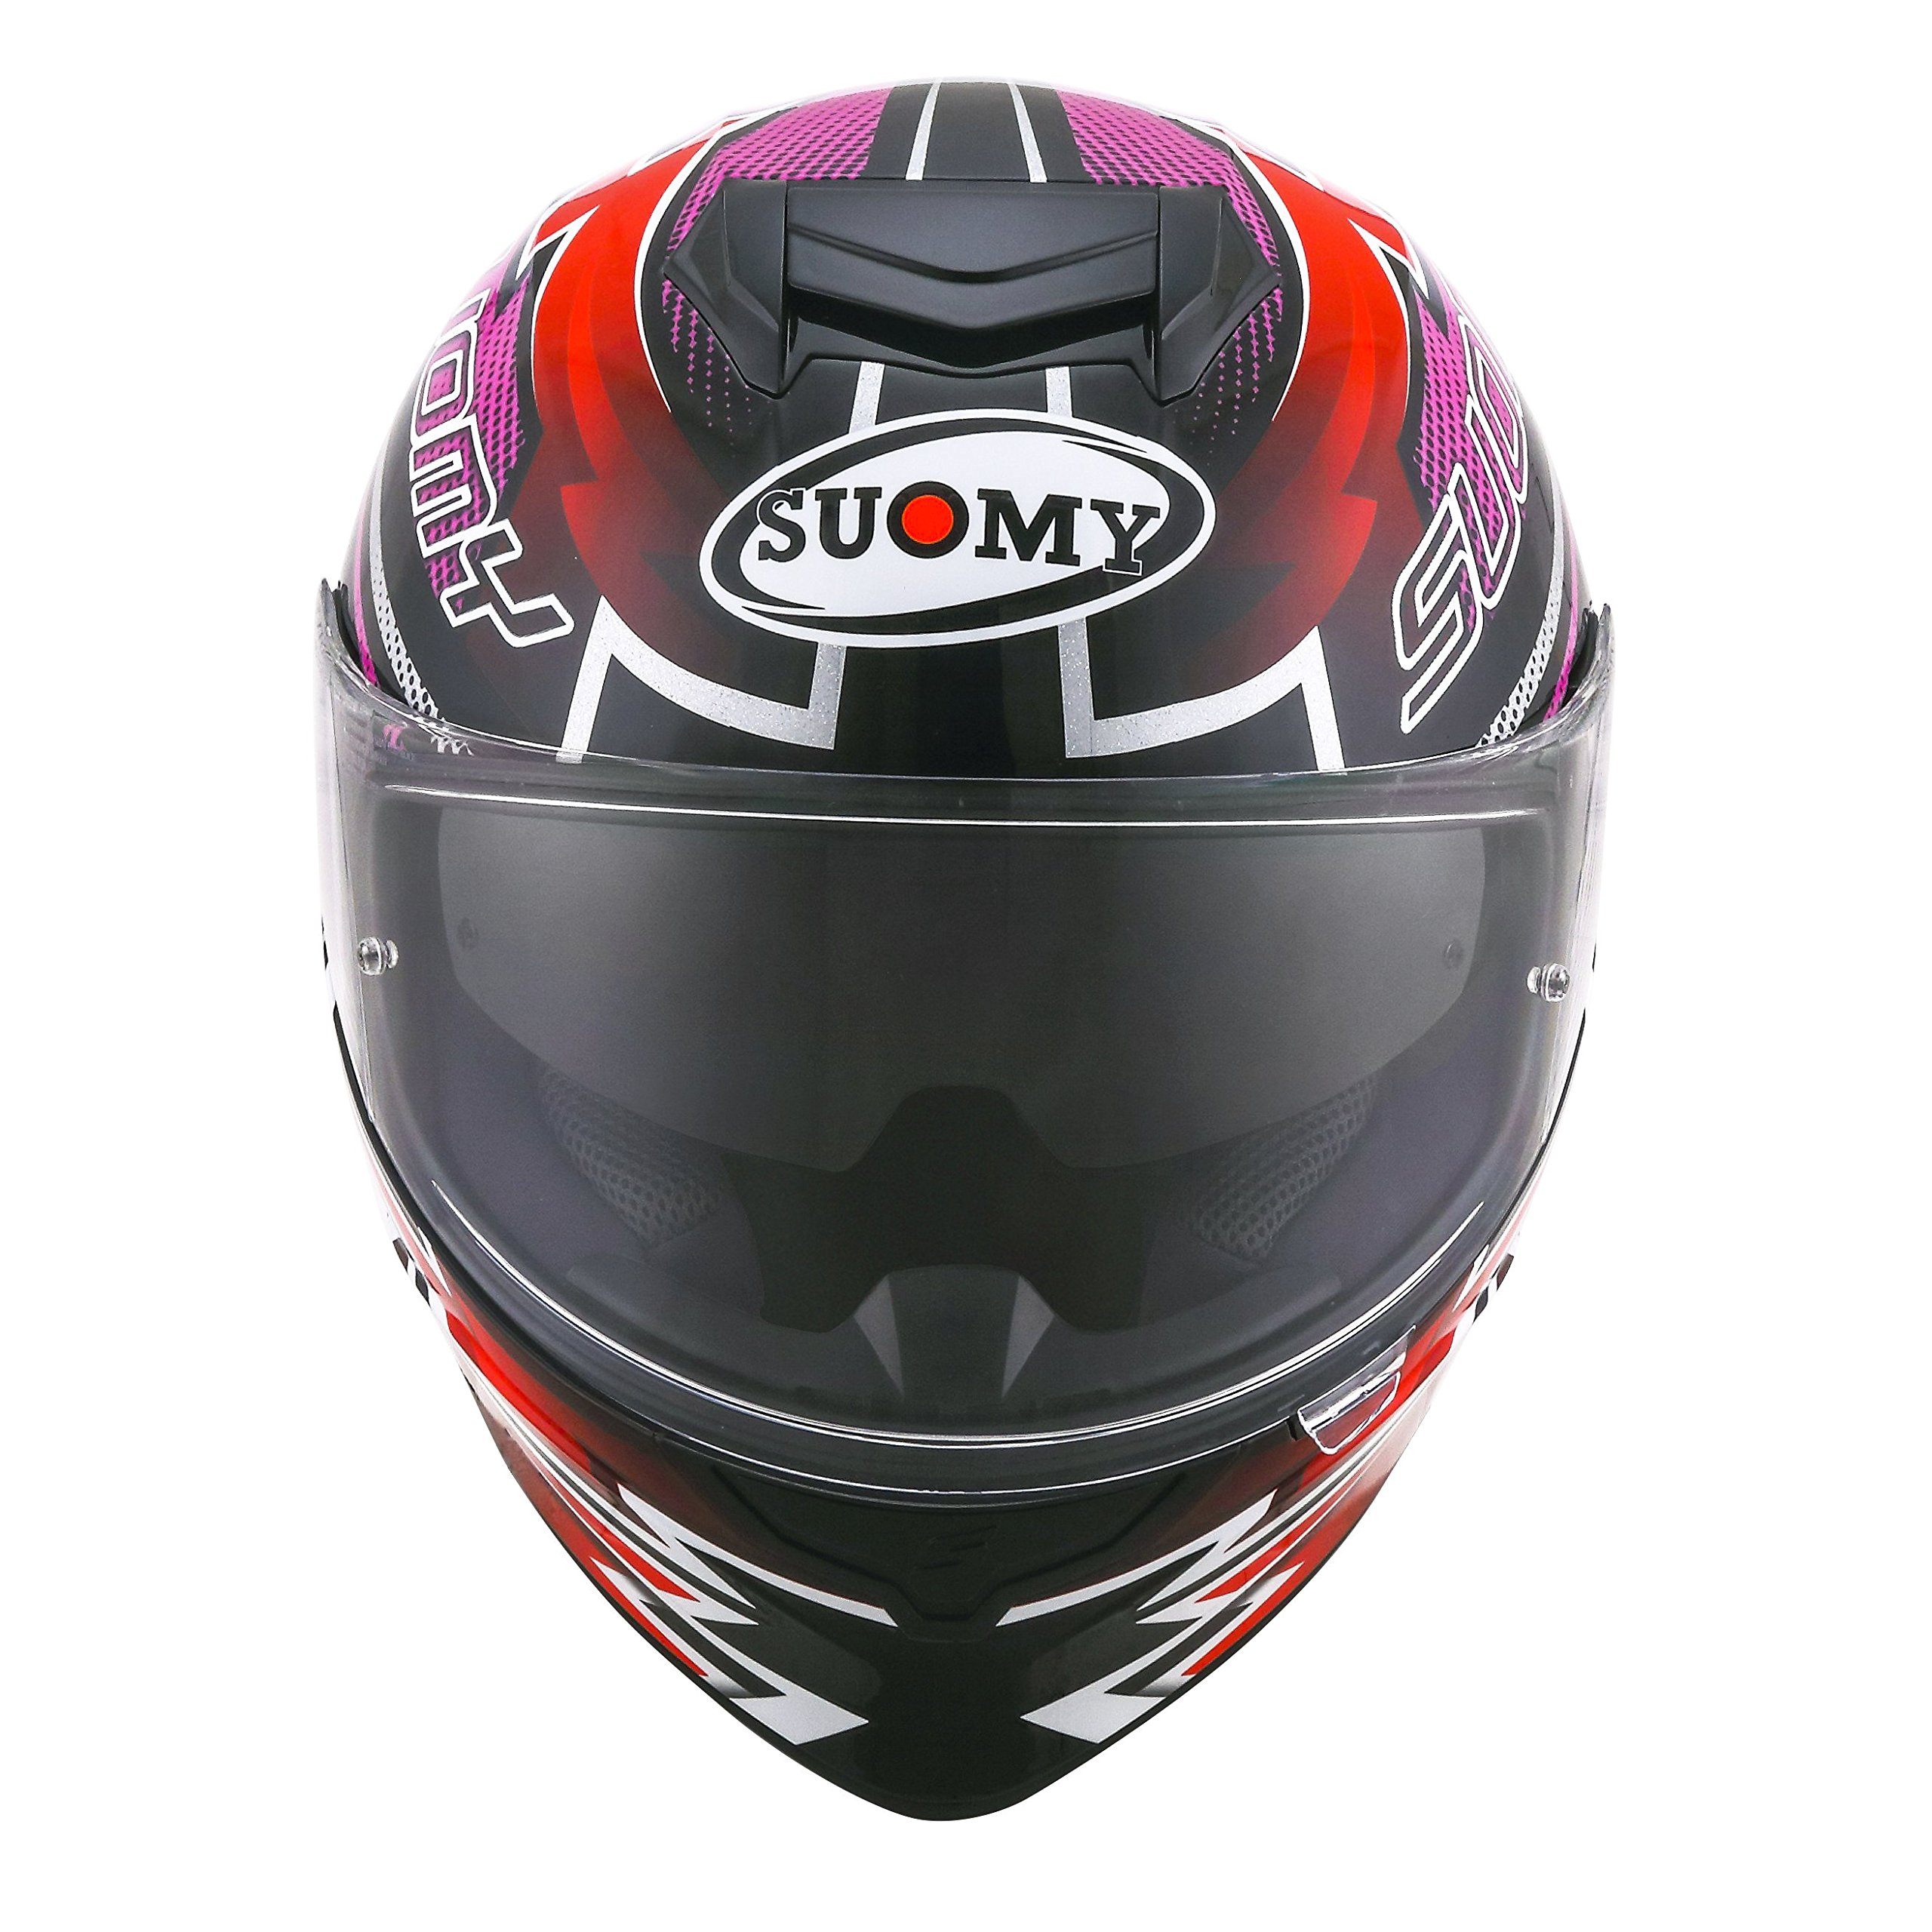 Suomy Helmet ksst0005.2